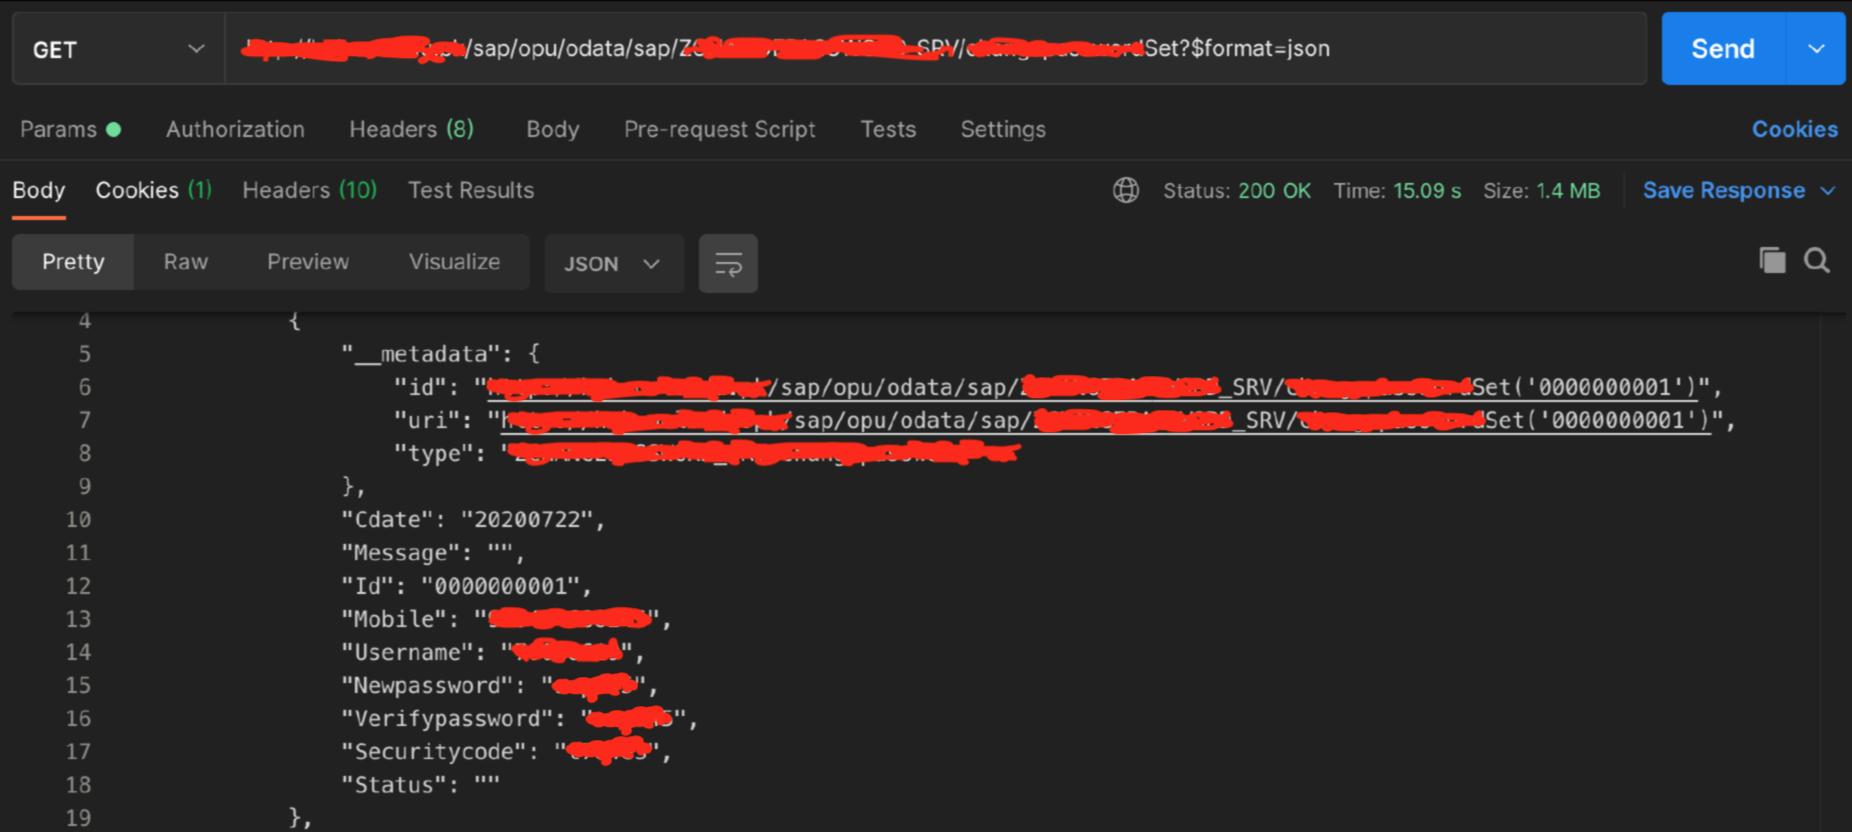 Exploitable%20service%20-%20List%20of%20User/Passwords